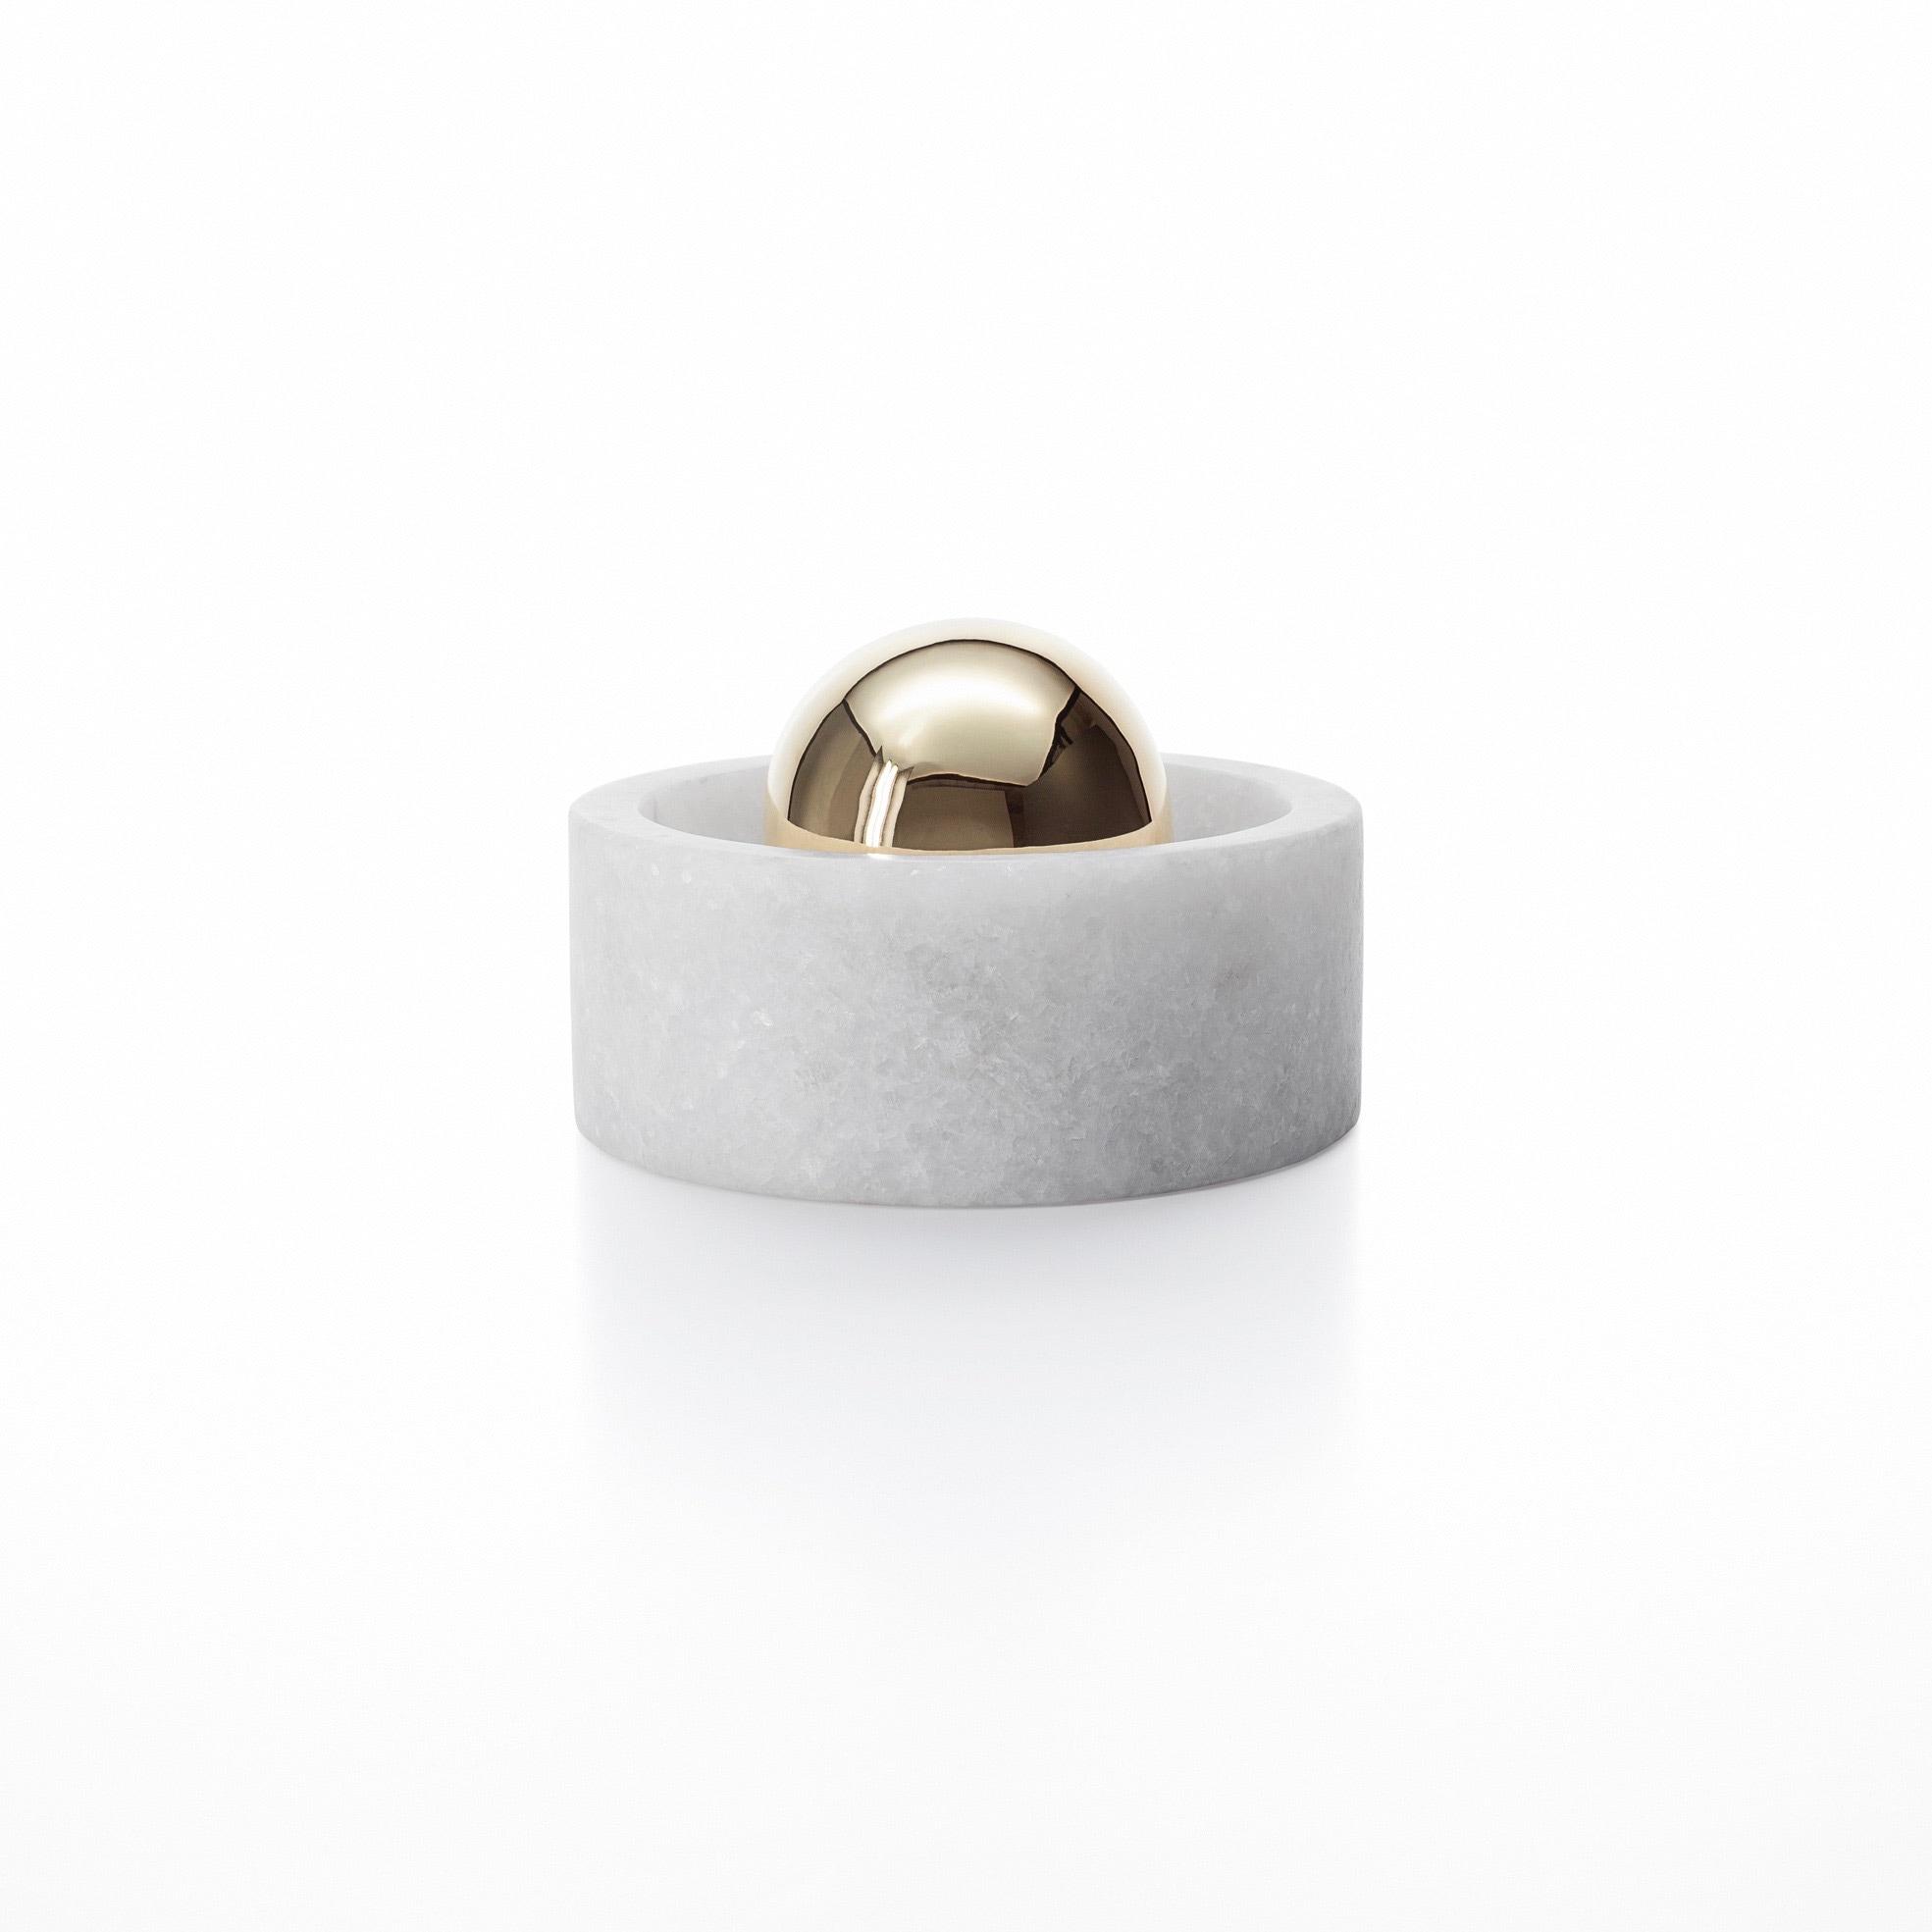 Stone spice grinder